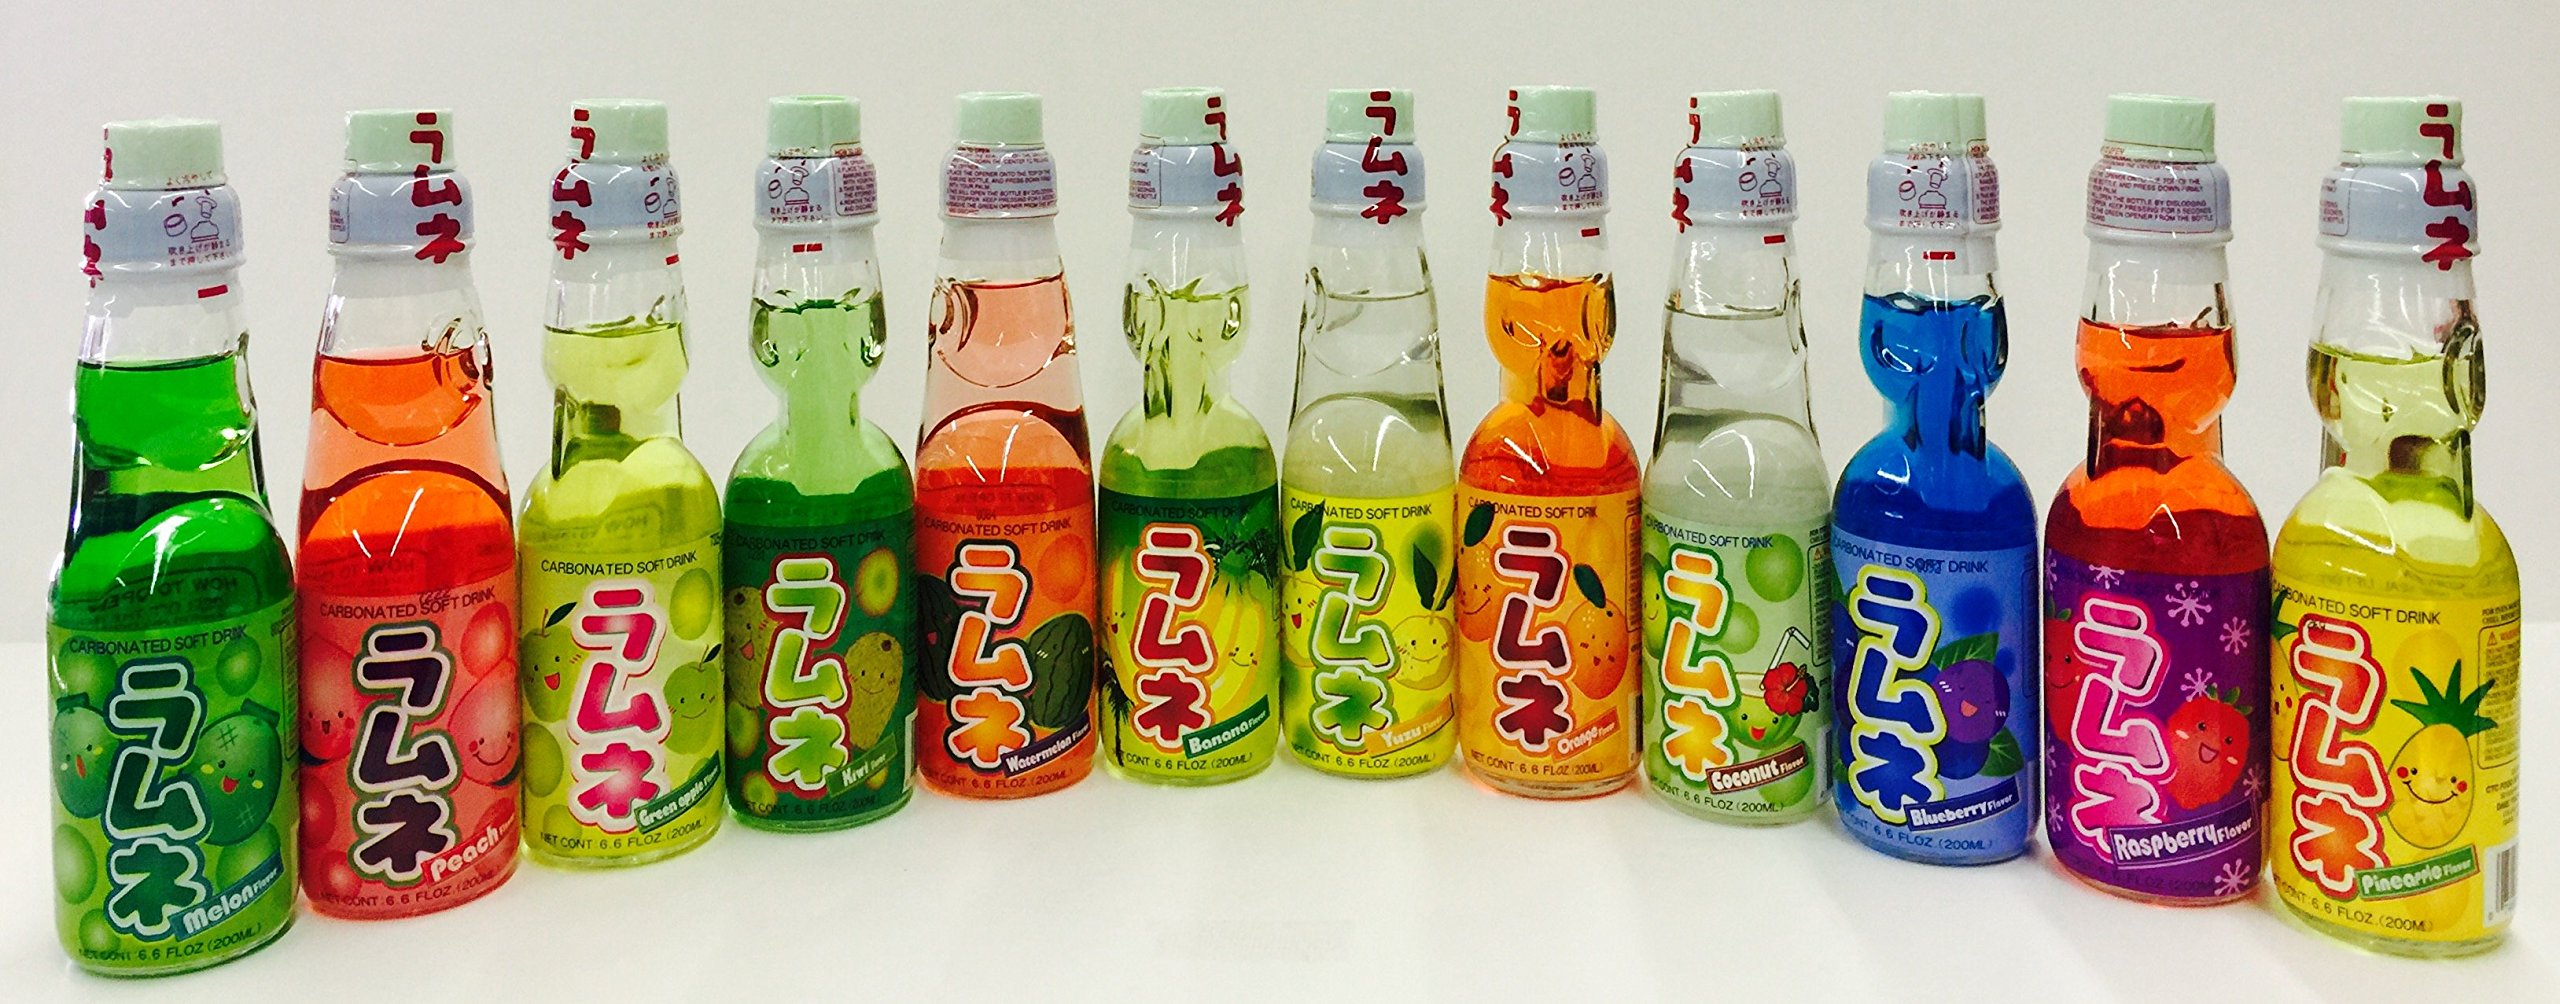 PowerMedley Ramune soda gift set (12 variety) by Power for Apple